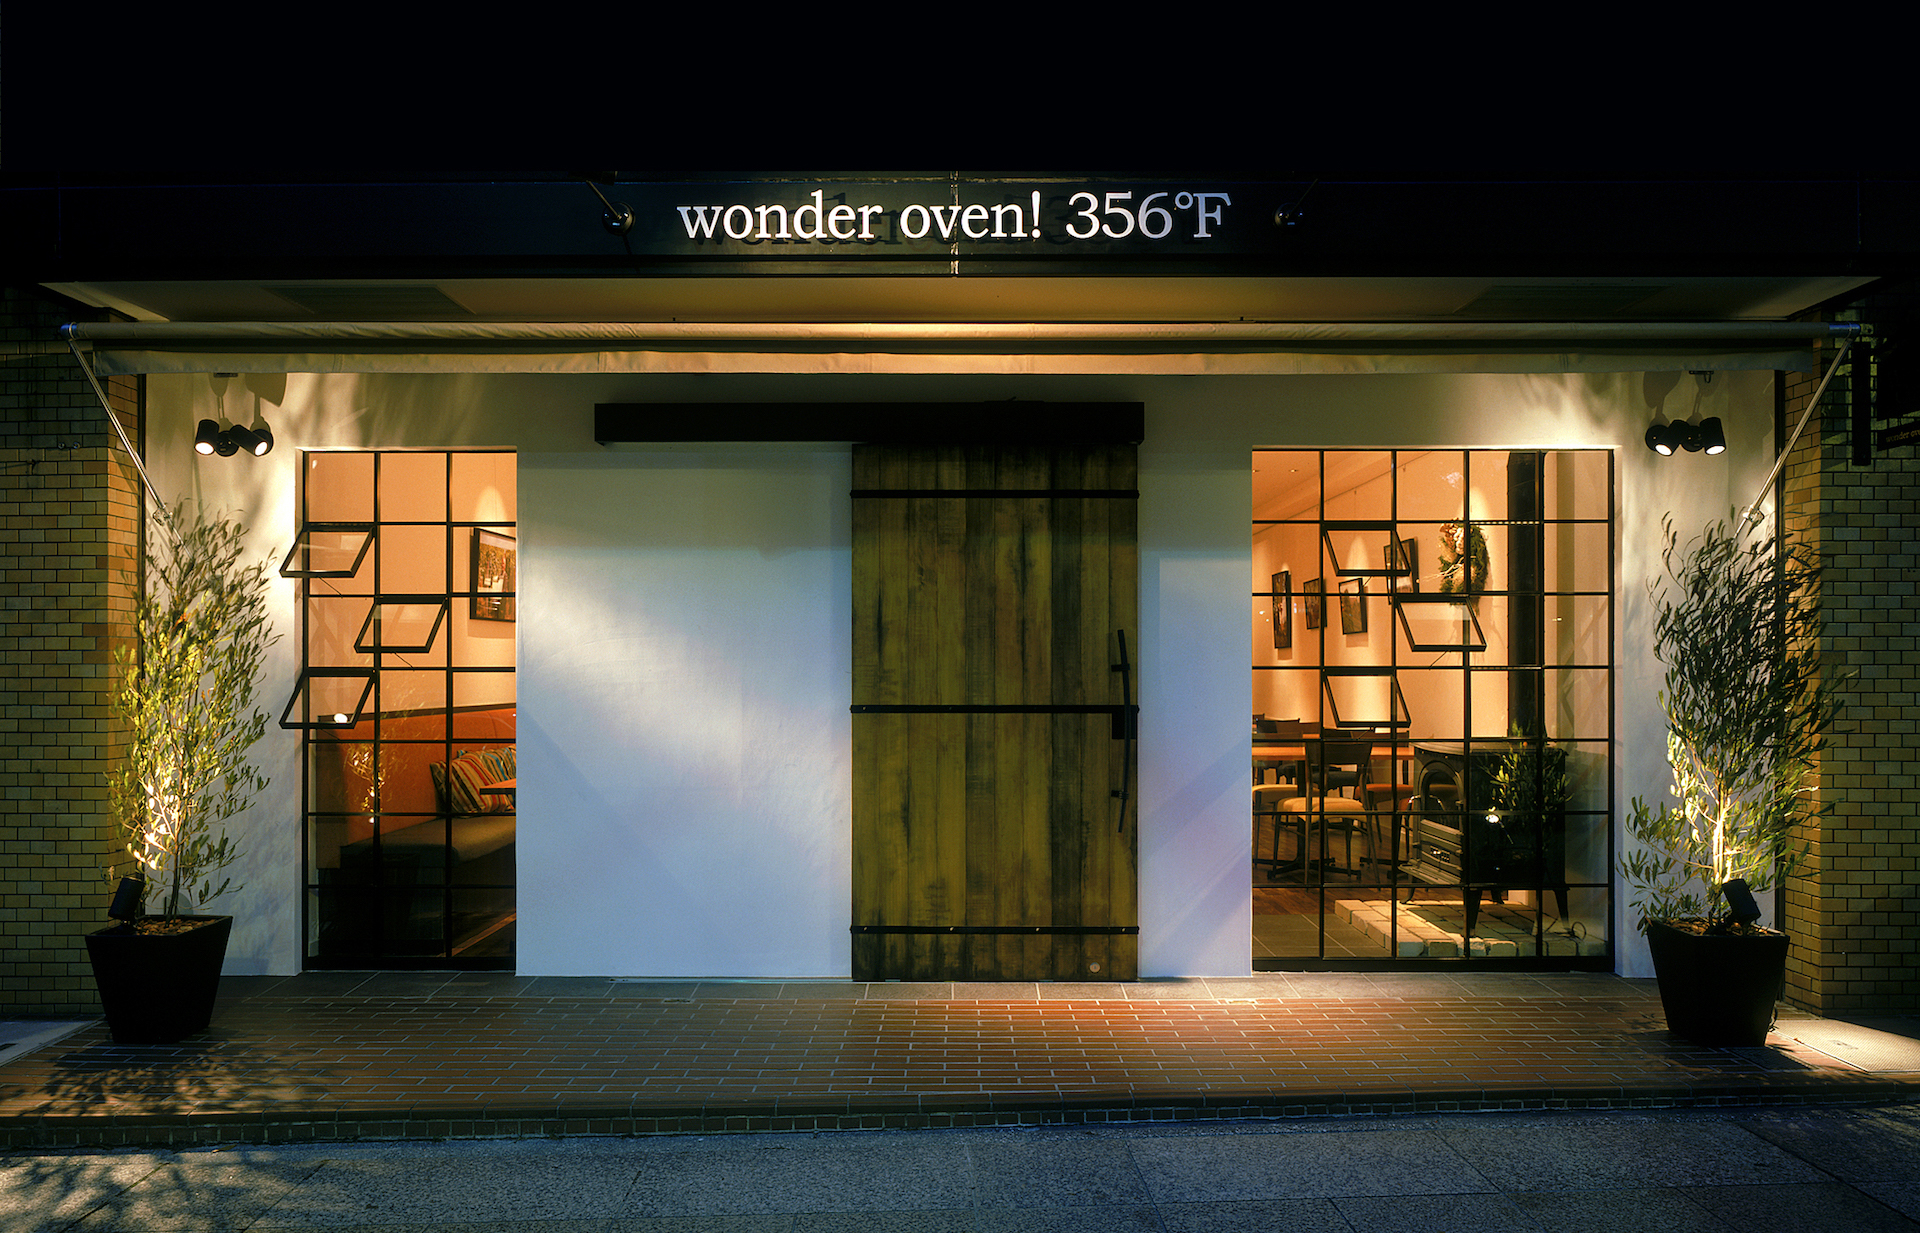 Wonder Oven!356°F